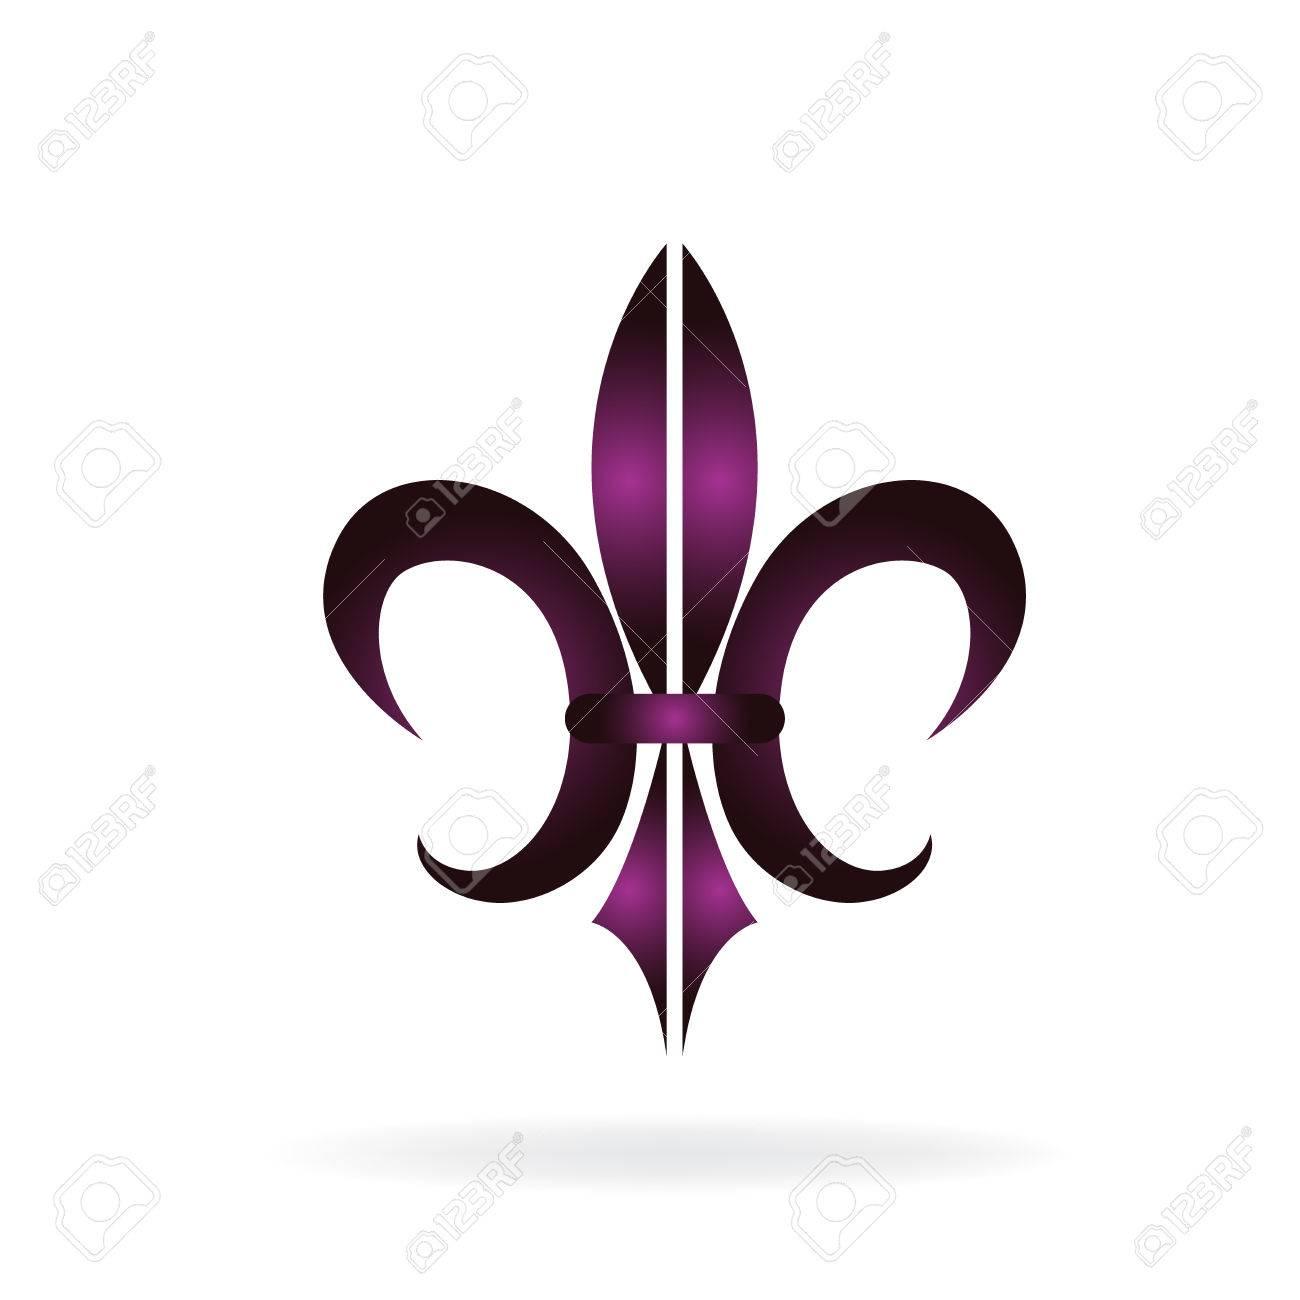 Fleur De Lis New Orleans Symbol Flower Logo Icon Vector Image Template Stock